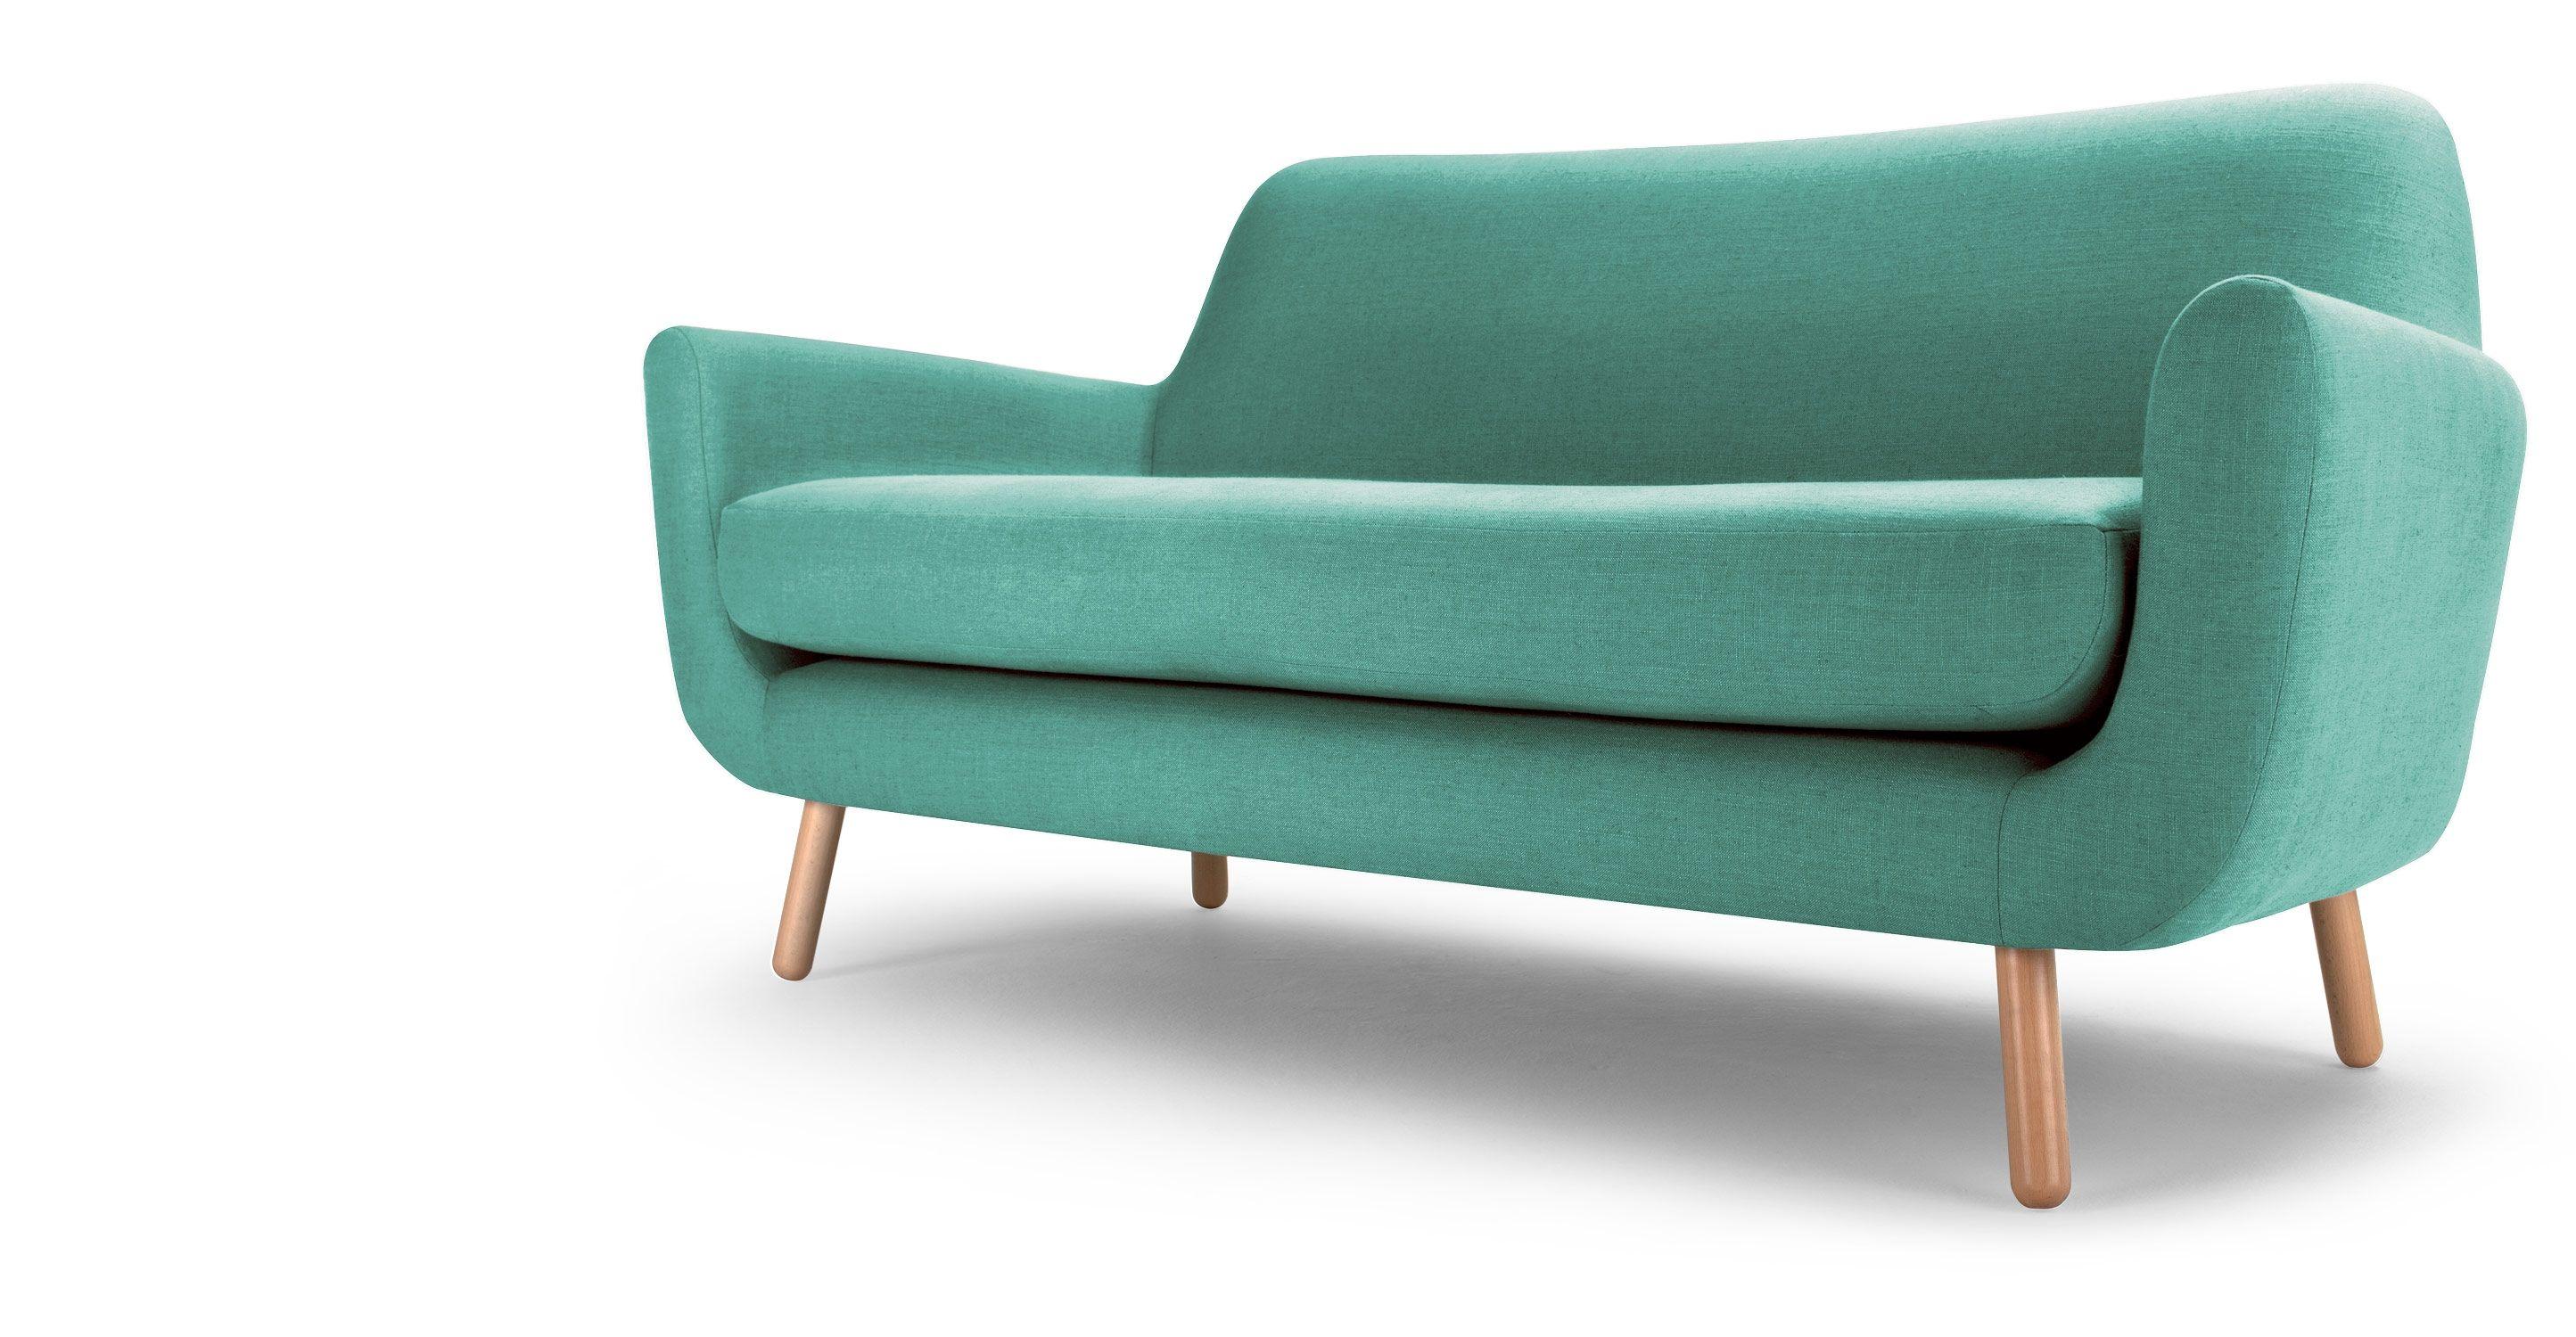 Jonah 2 Seater Sofa In Med Blue Made Com Sofa Design 2 Seater Sofa Sofa